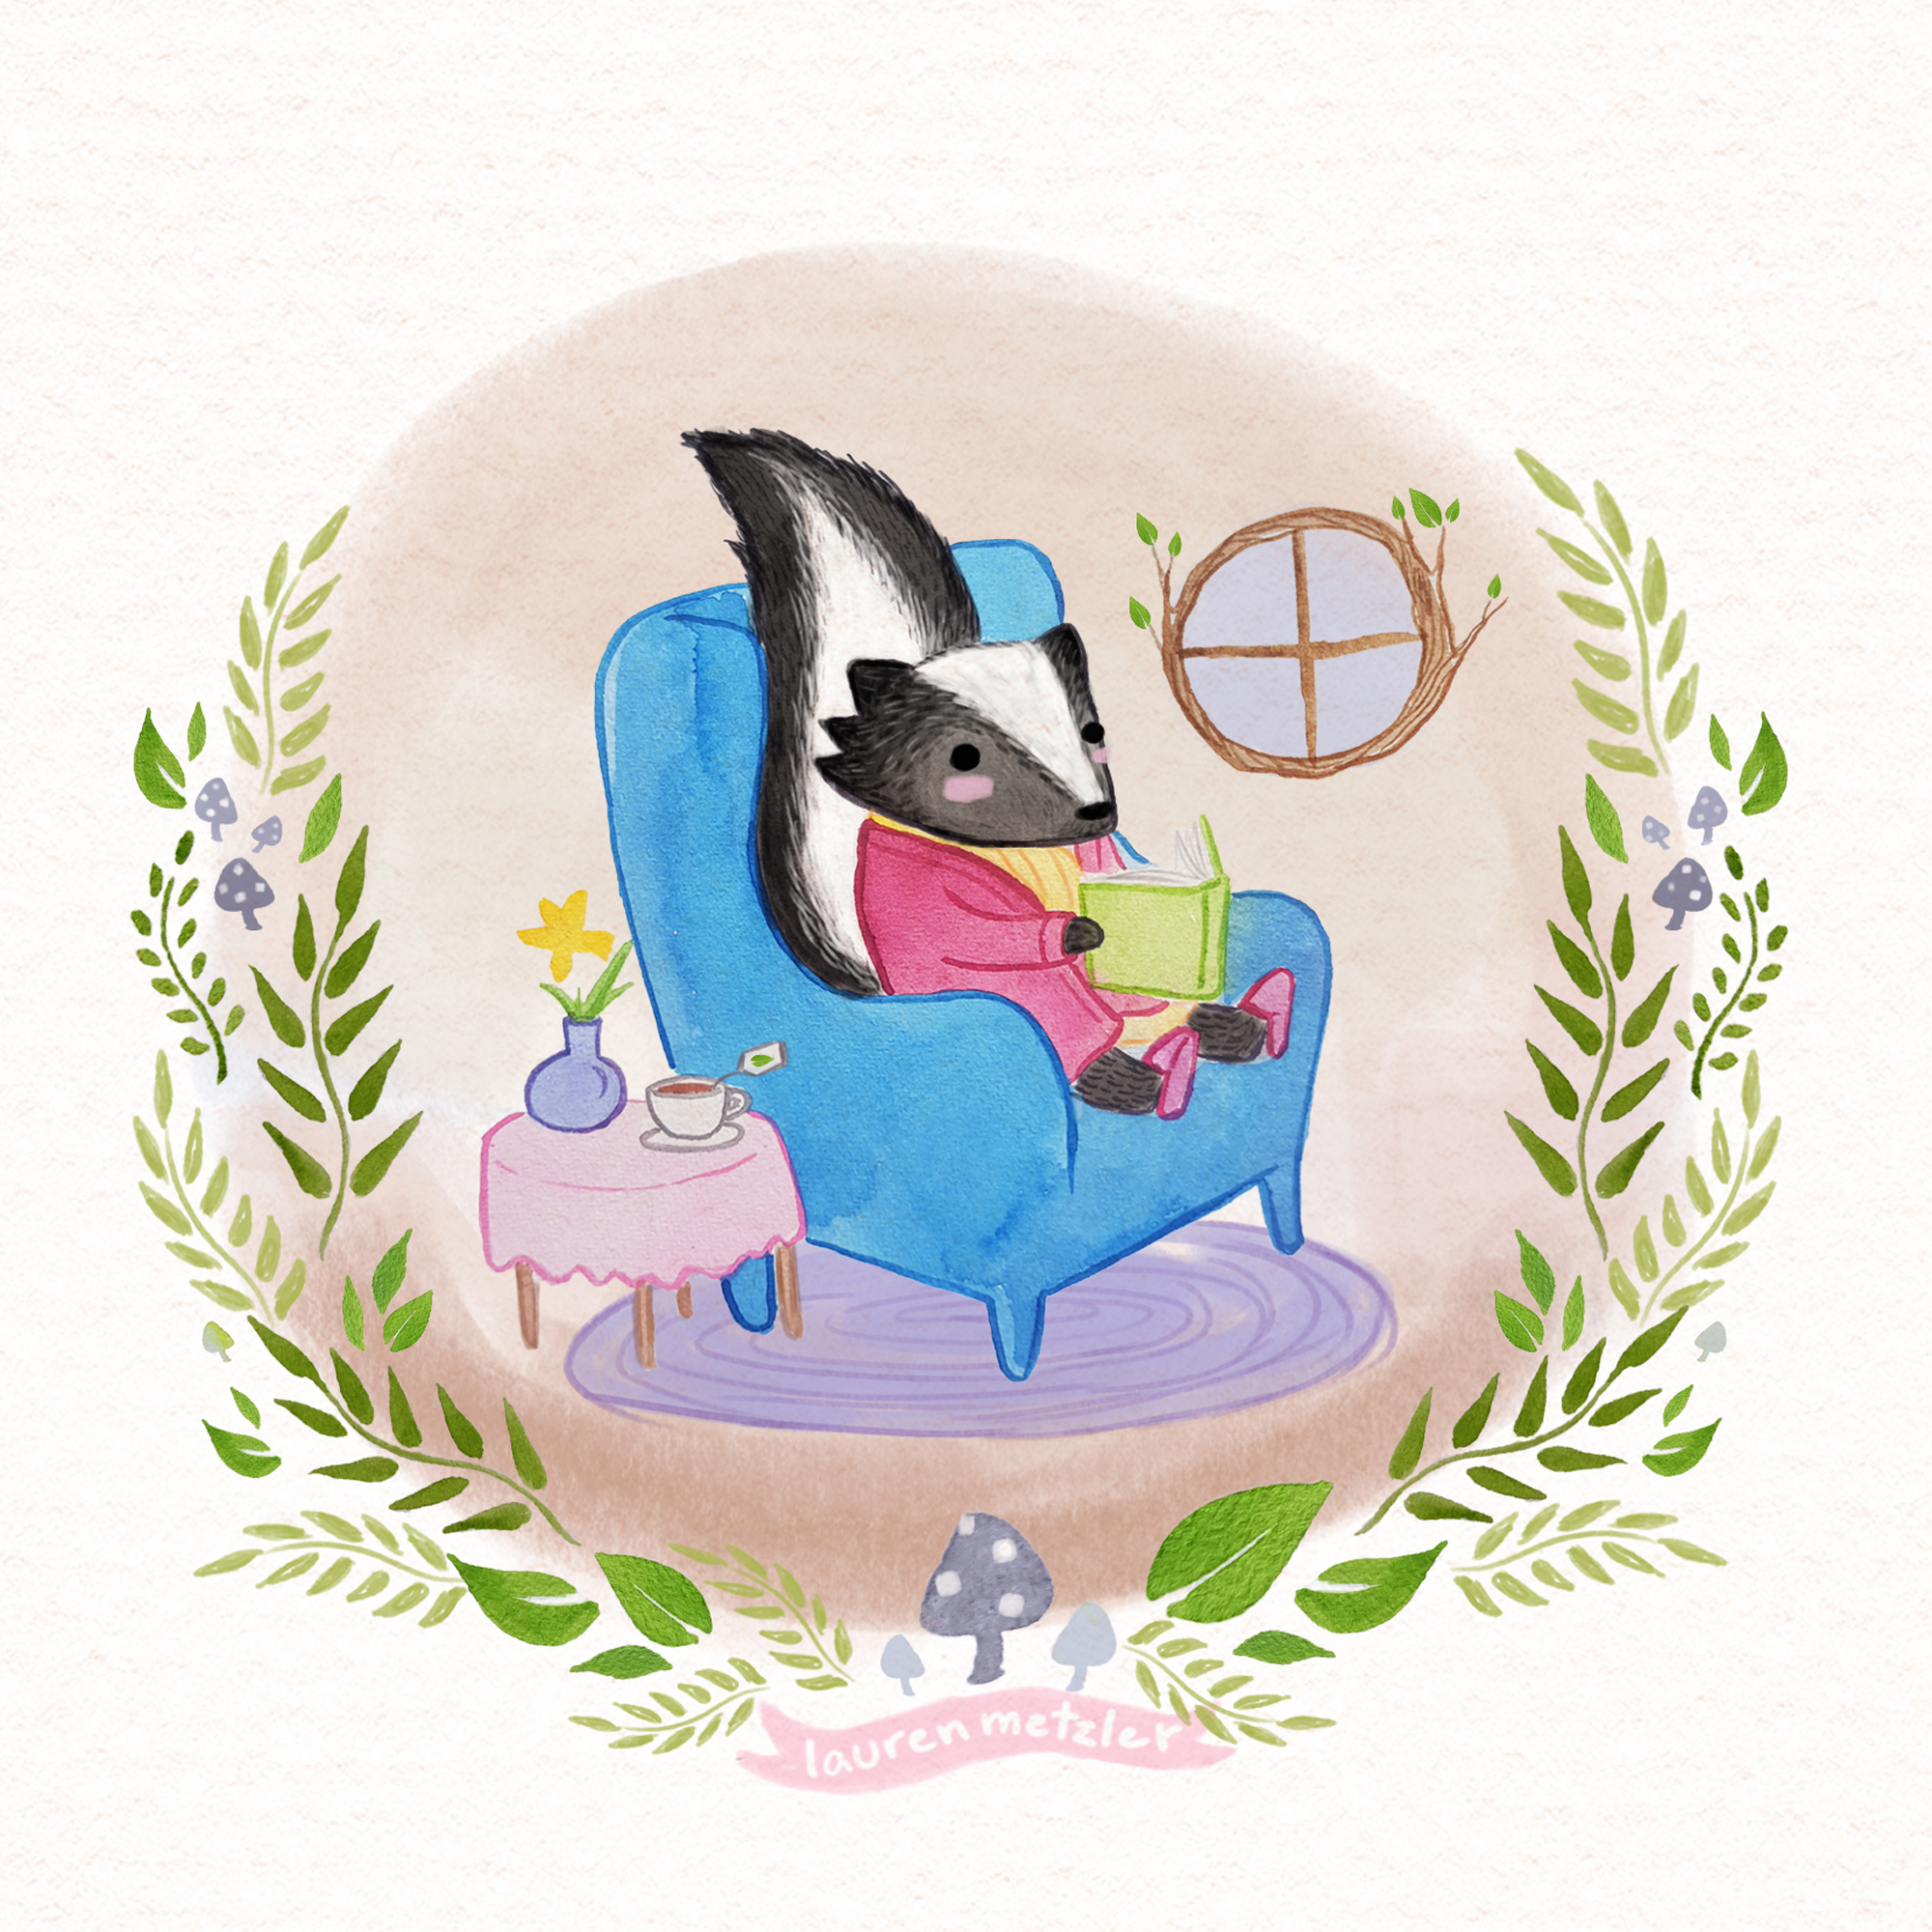 Oregon skunk reading book. print by Lauren Metzler. See more of my prints at laurenmetzler.com